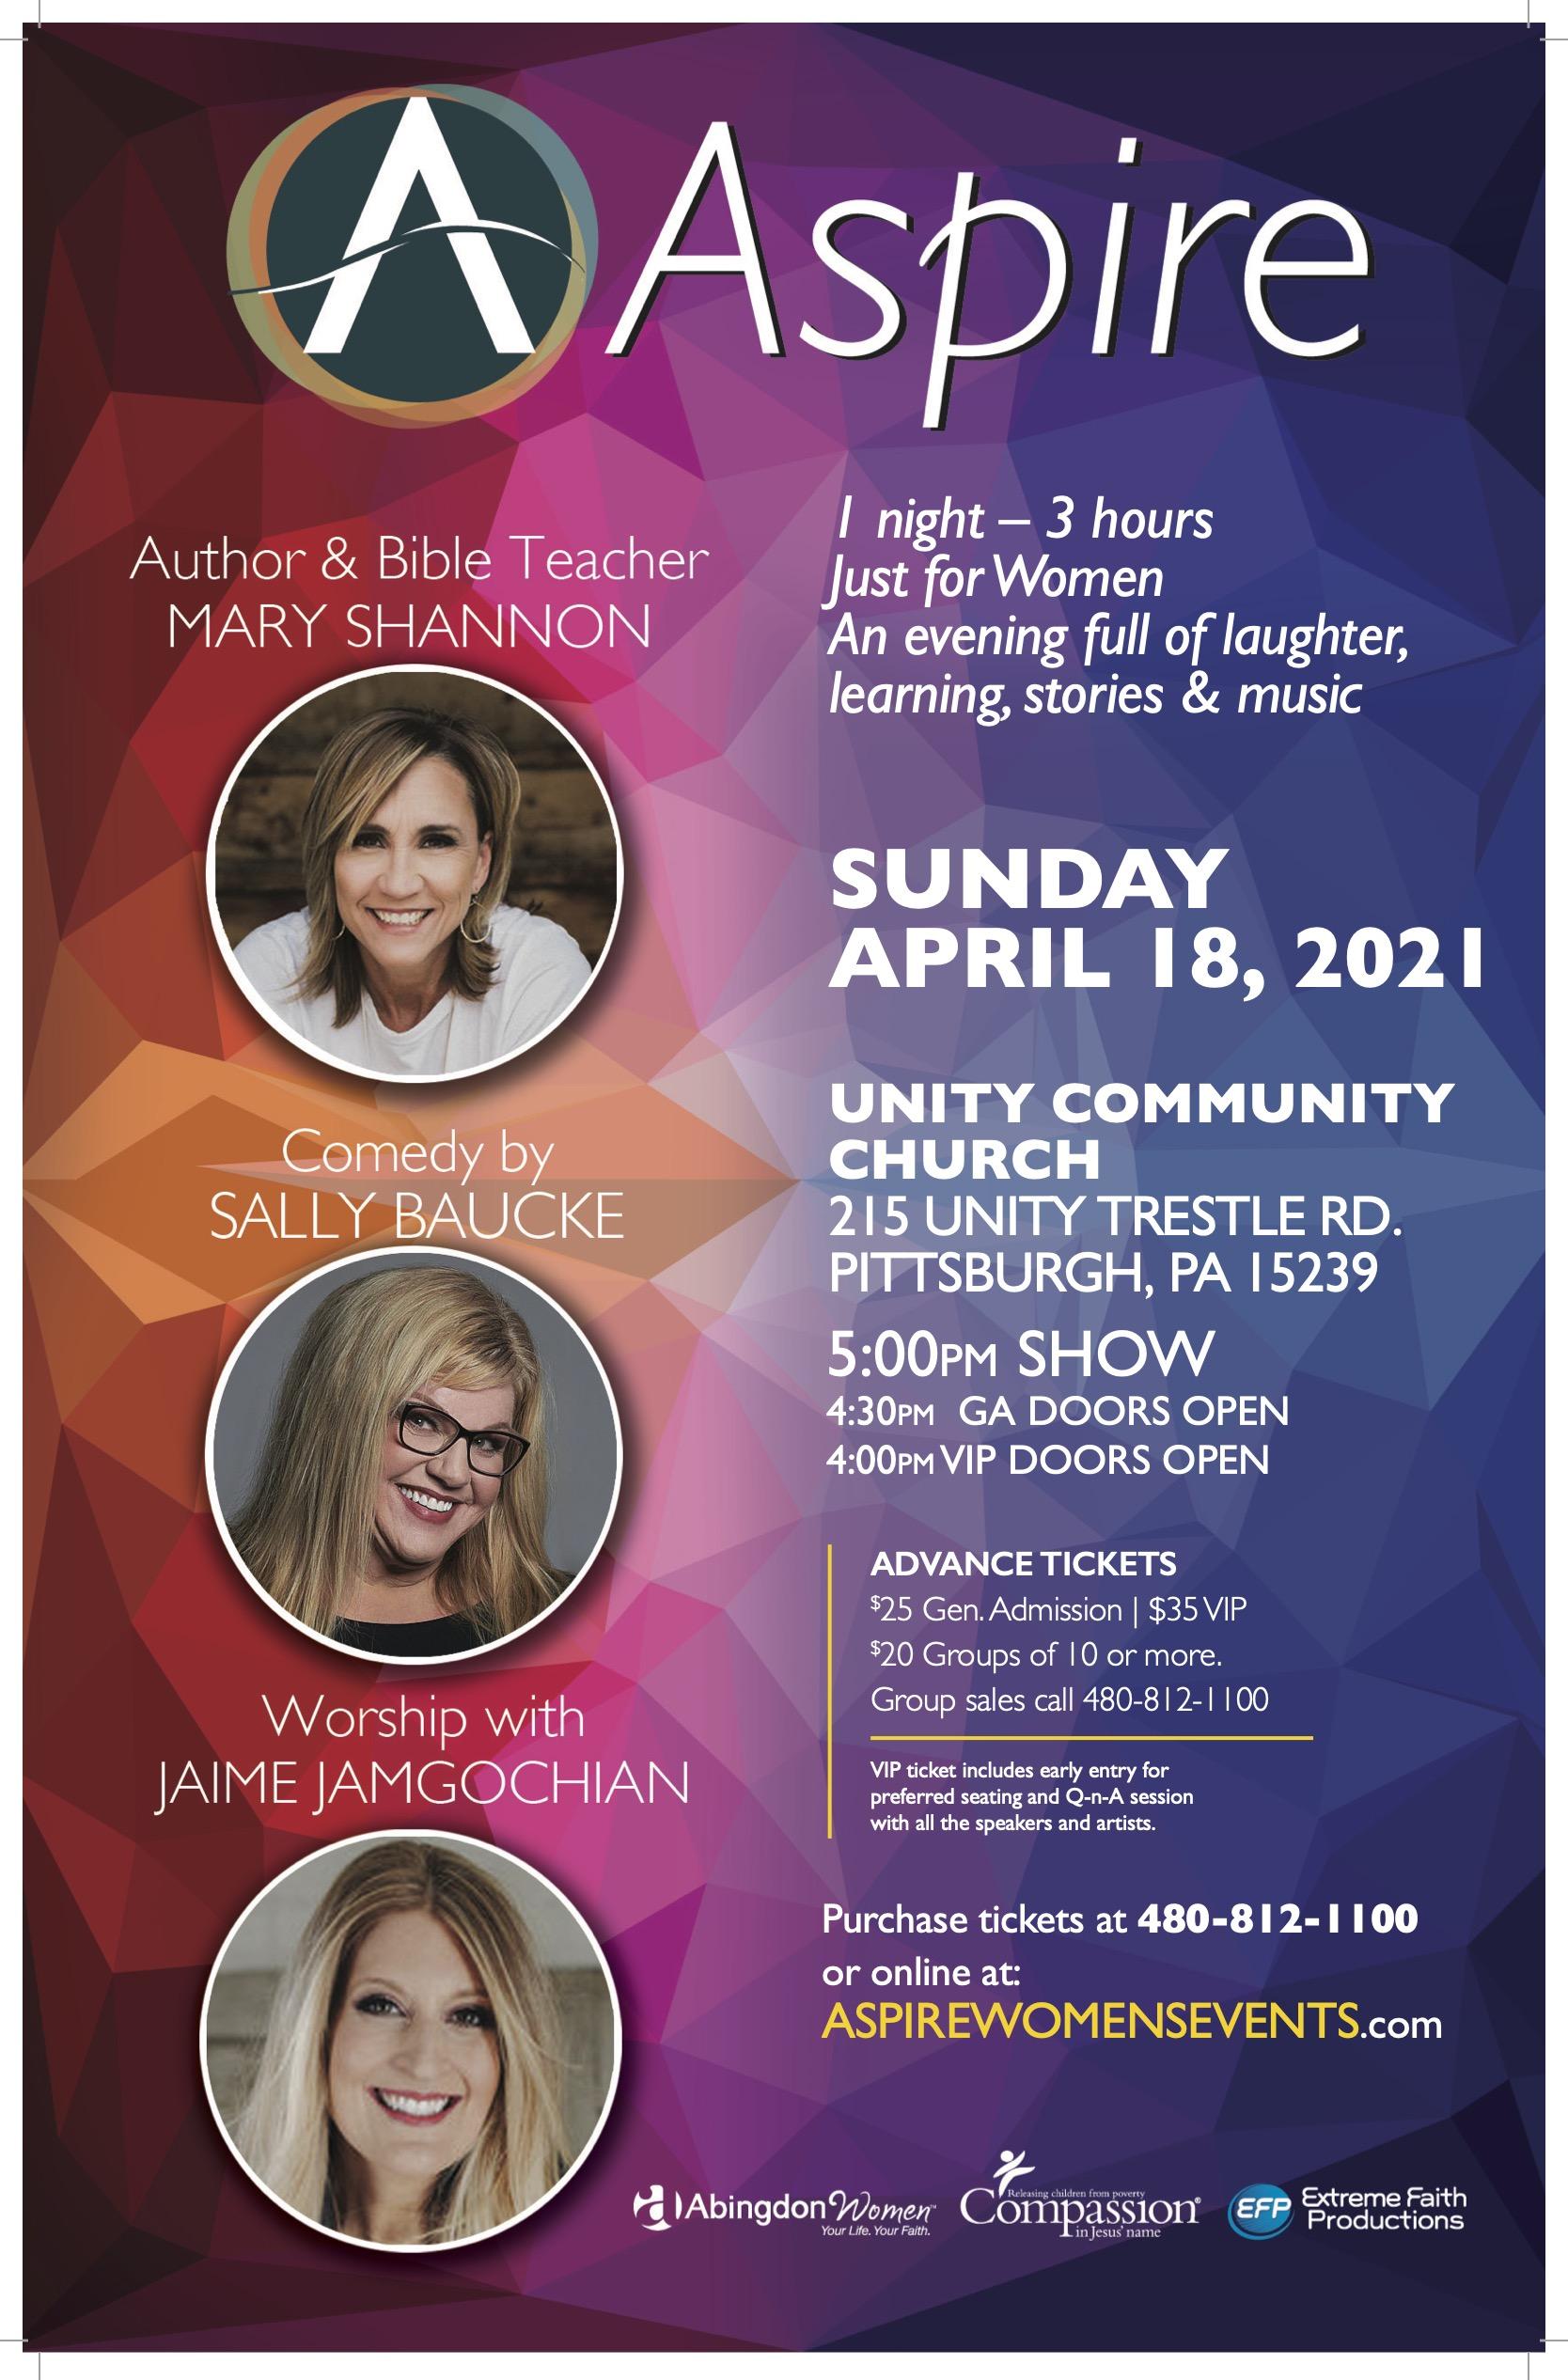 ASPIRE SUN-April 18-PLUM Pittsburgh